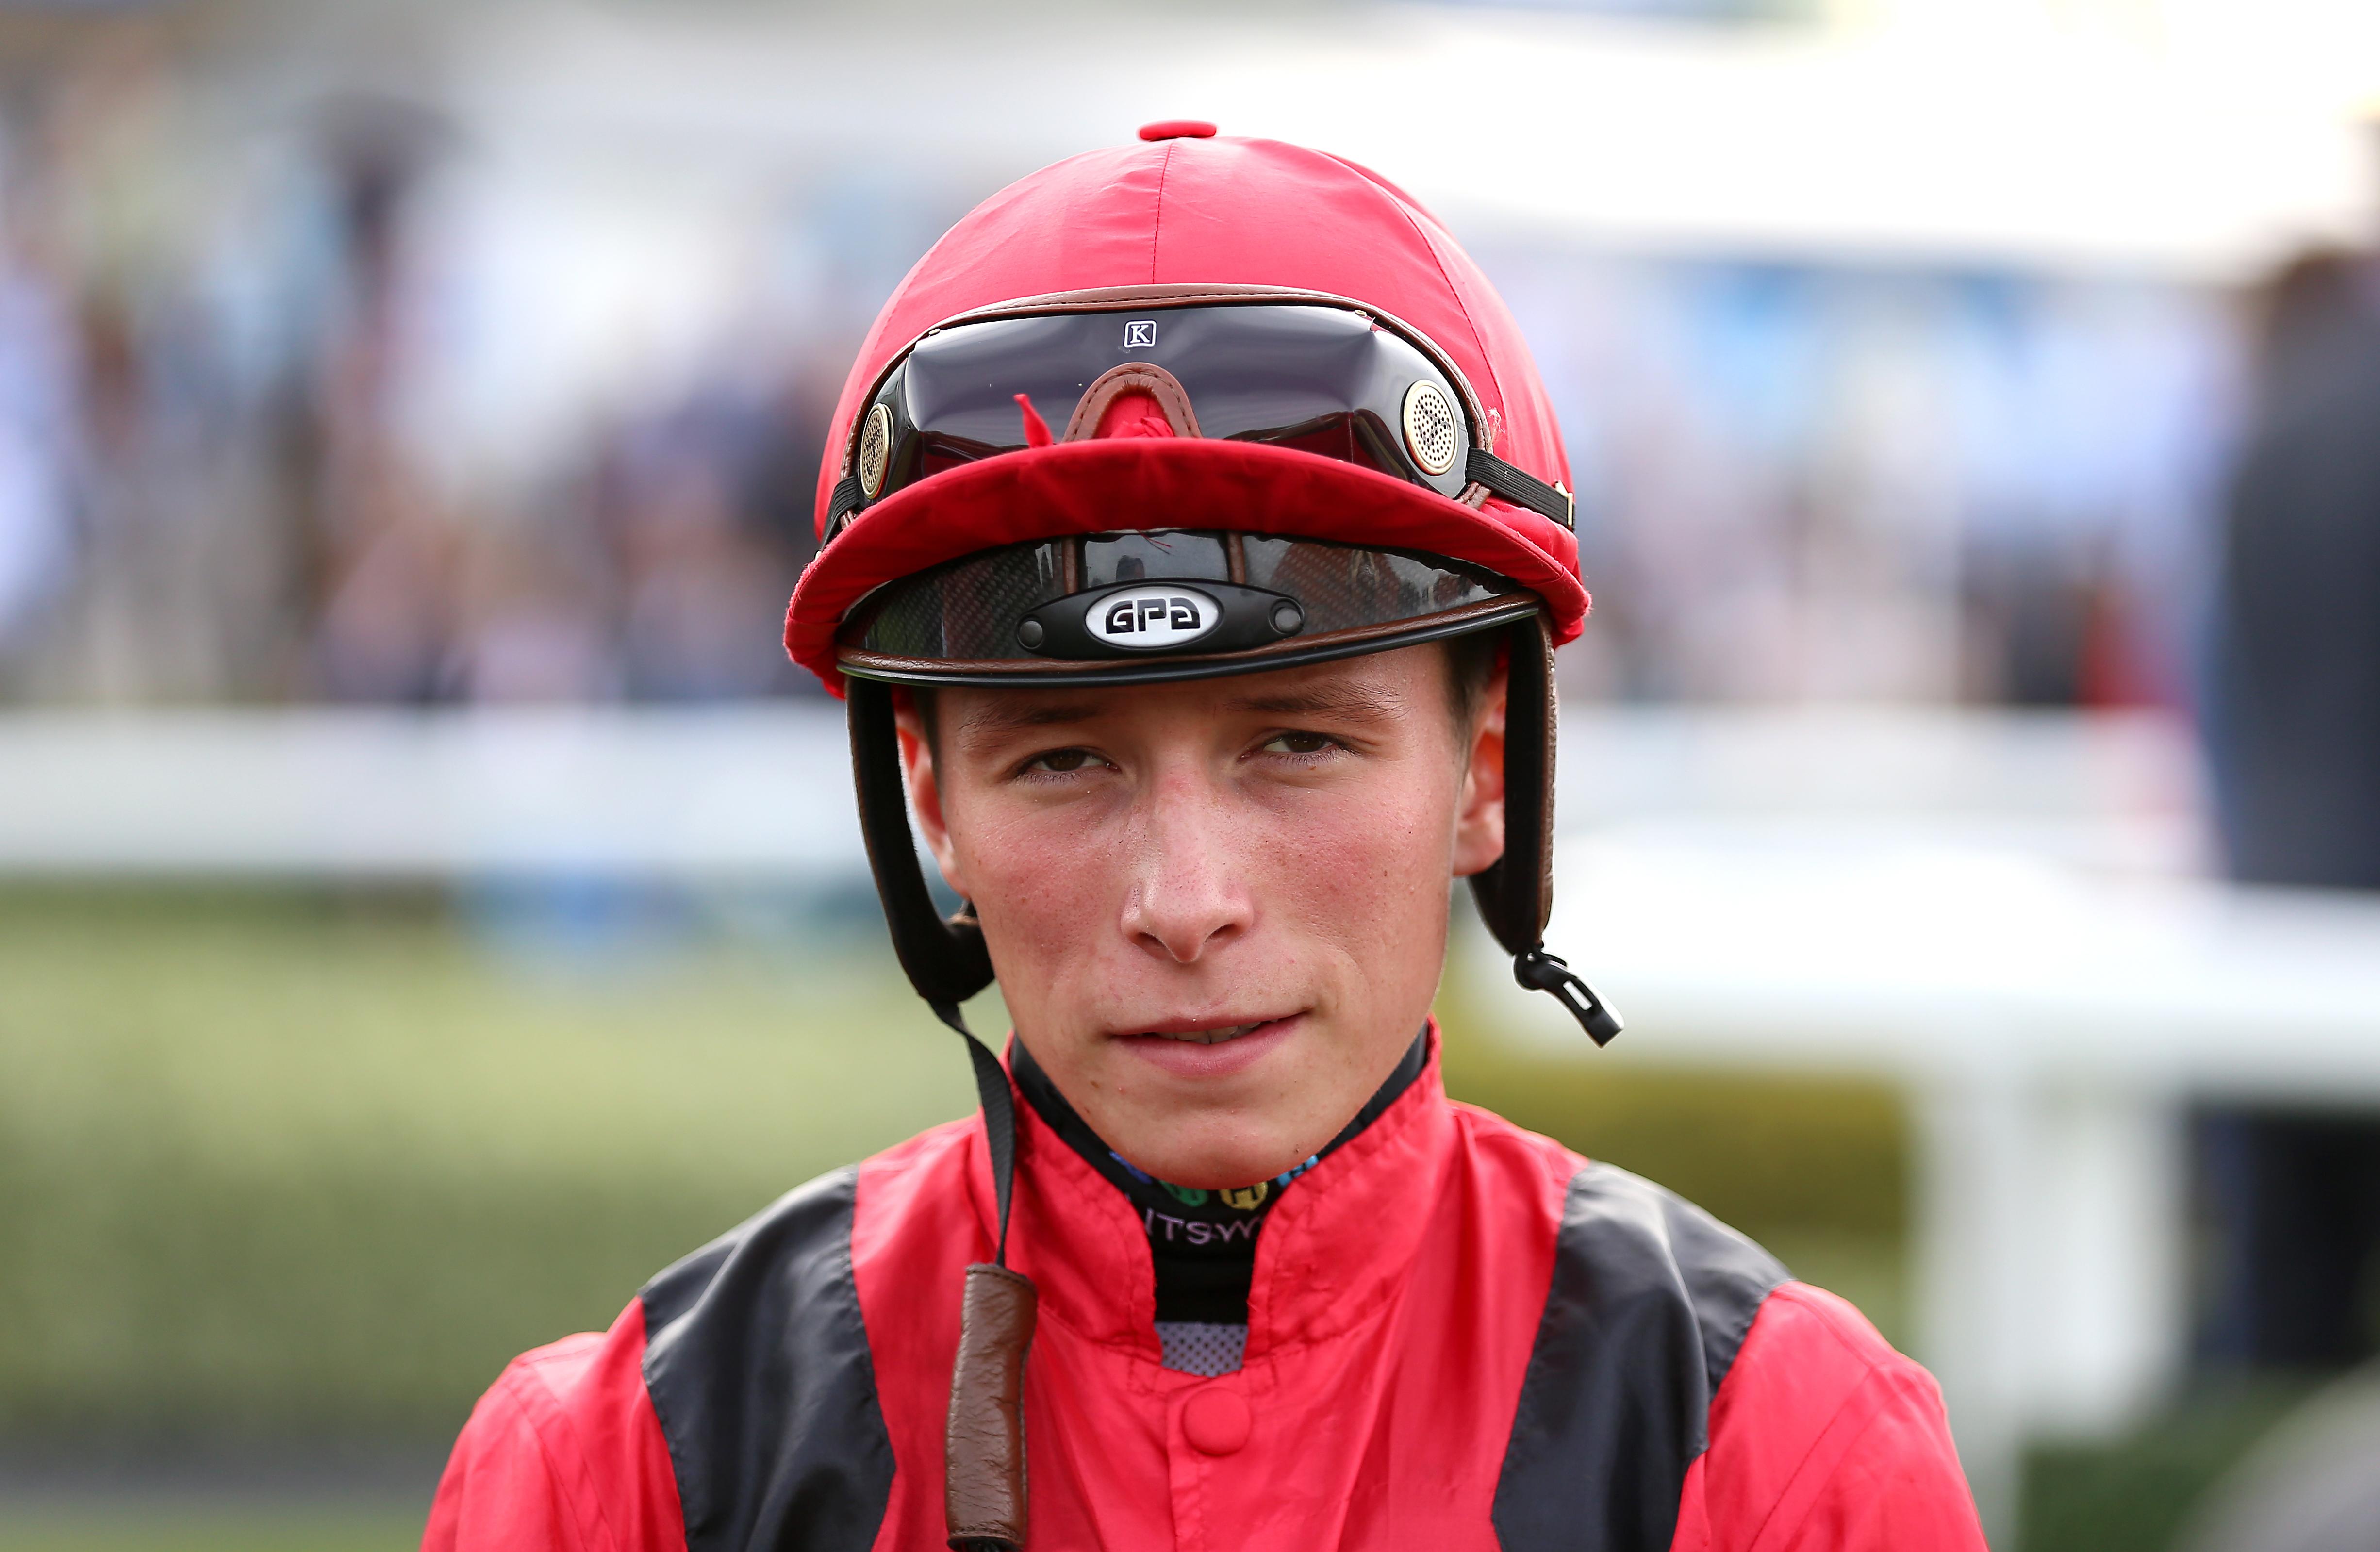 Jason Watson is widely tipped as a future champion jockey